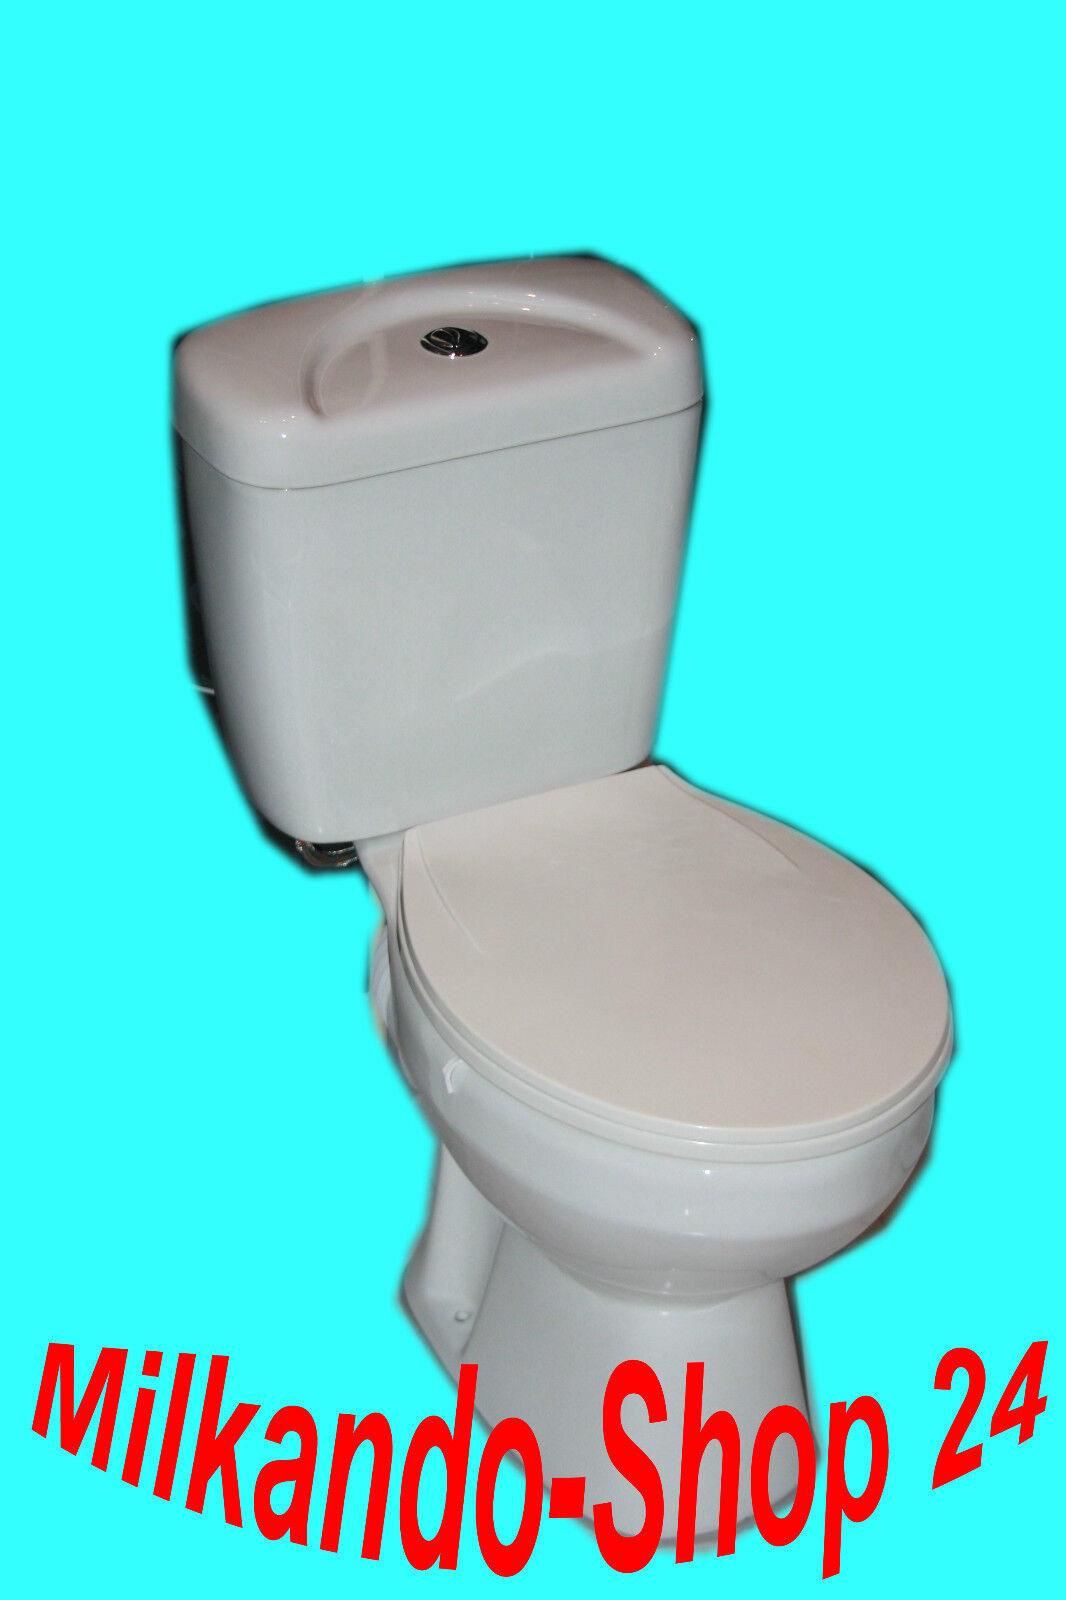 wc toilette stand komplett set mit sp lkasten komplett aus keramik inkl wc sitz eur 127 00. Black Bedroom Furniture Sets. Home Design Ideas